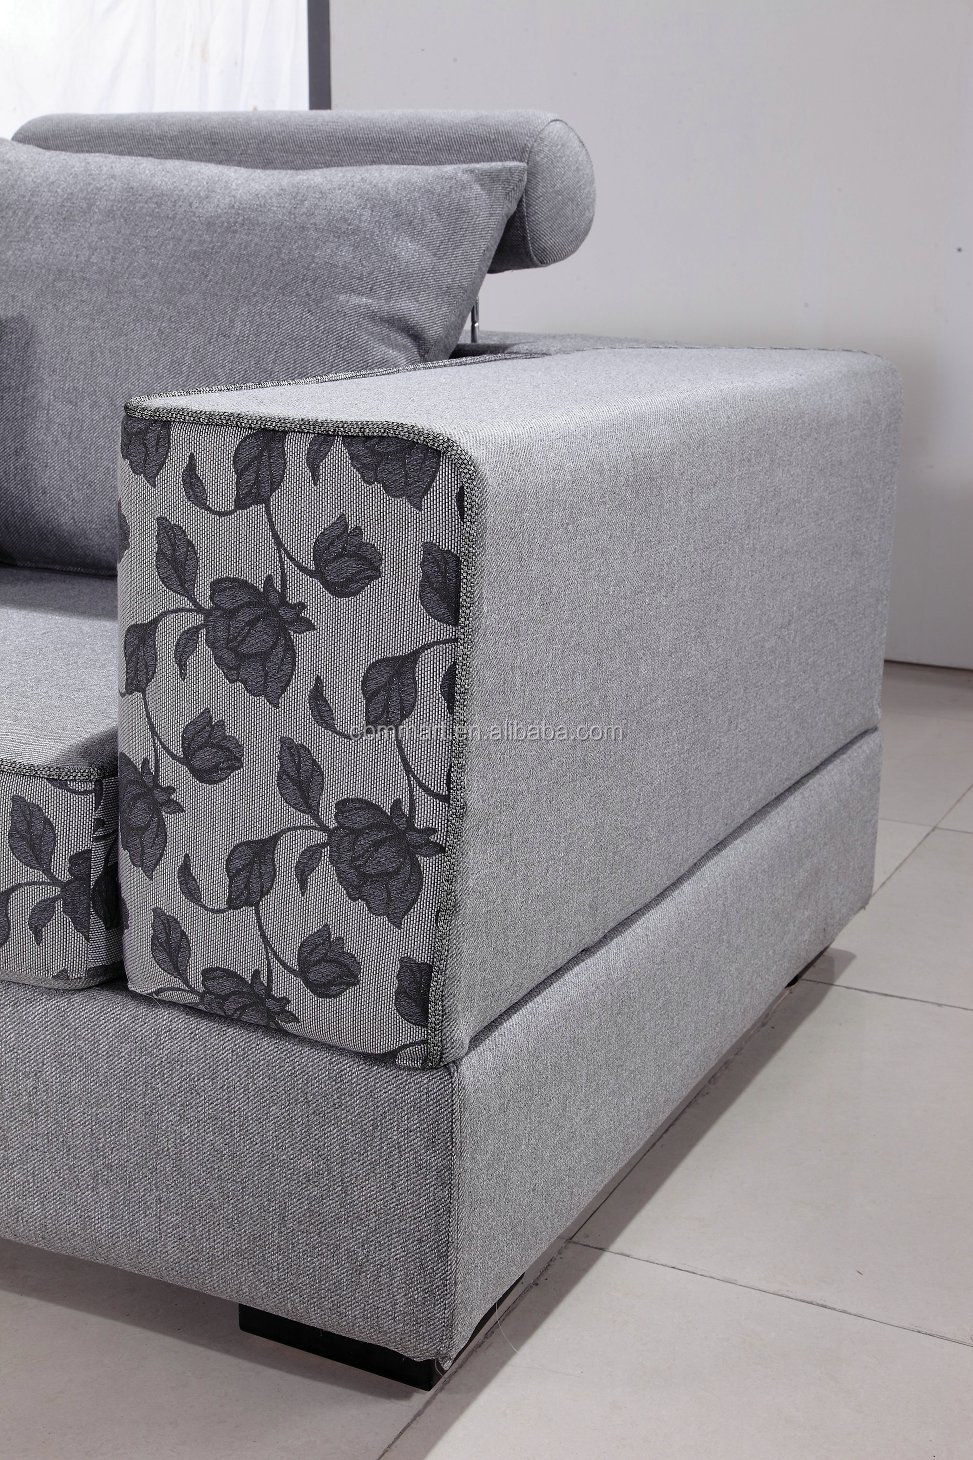 Tapestry Sofa Living Room Furniture Chenille Jacquard Sofa Fabric Sofa Tapestry Fabric Buy Chenille